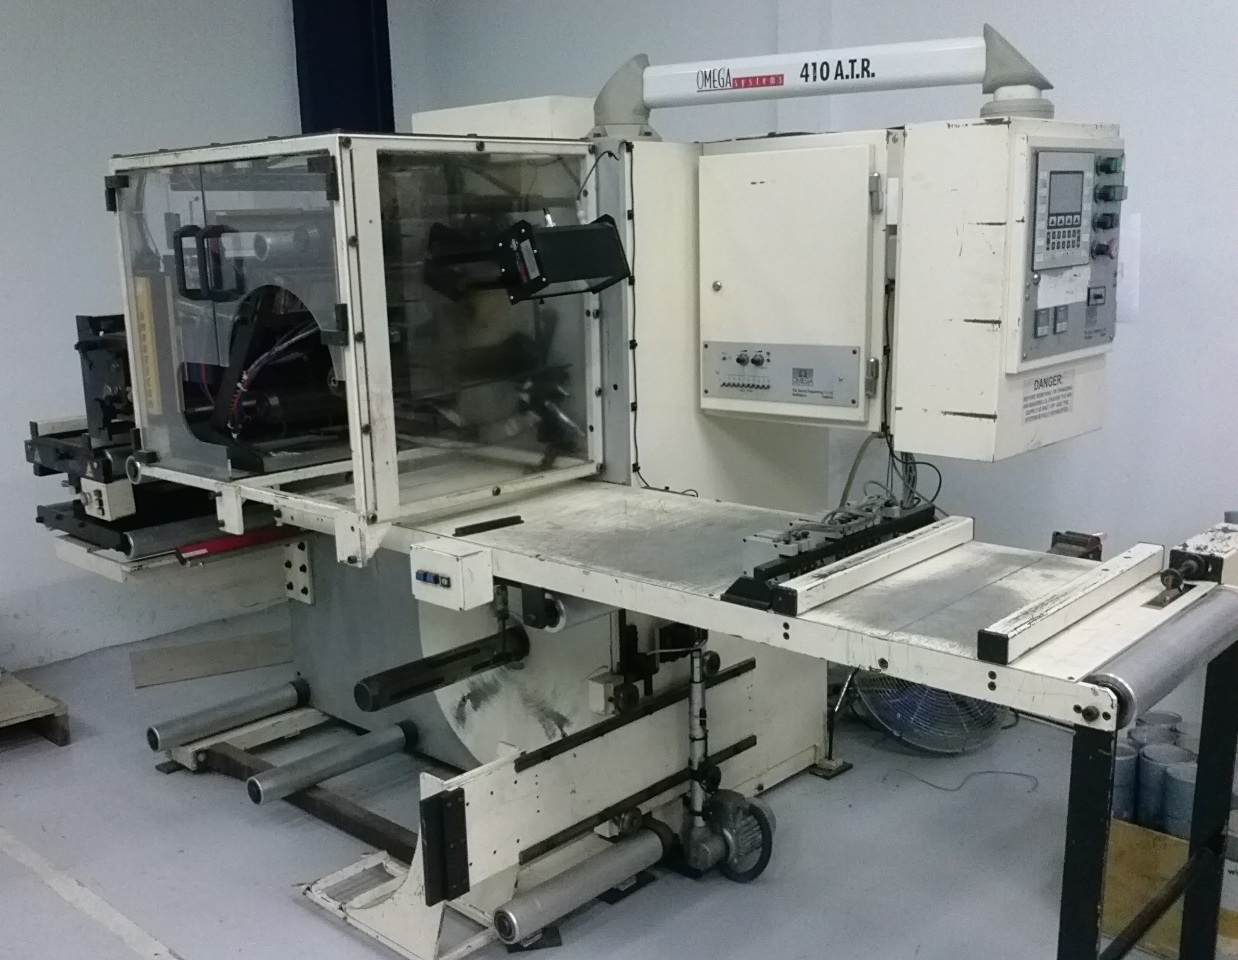 ABG Omega 410 ATR - Used Flexo Printing Presses and Used Flexographic Equipment-0